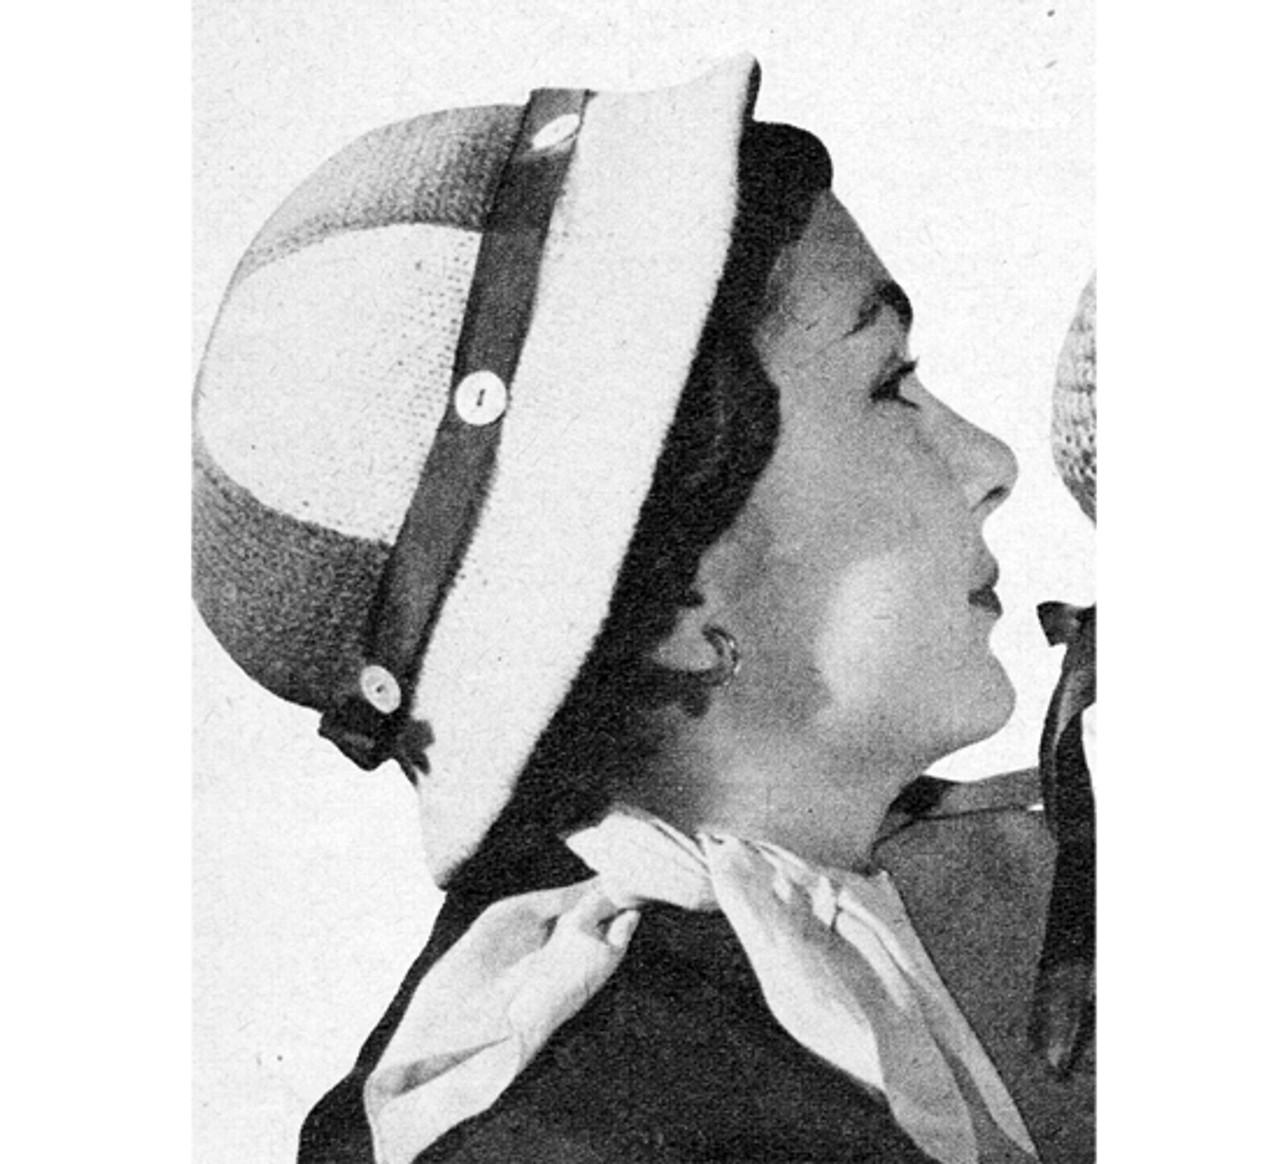 Triangle Cloche Knitting Pattern with narrow brim